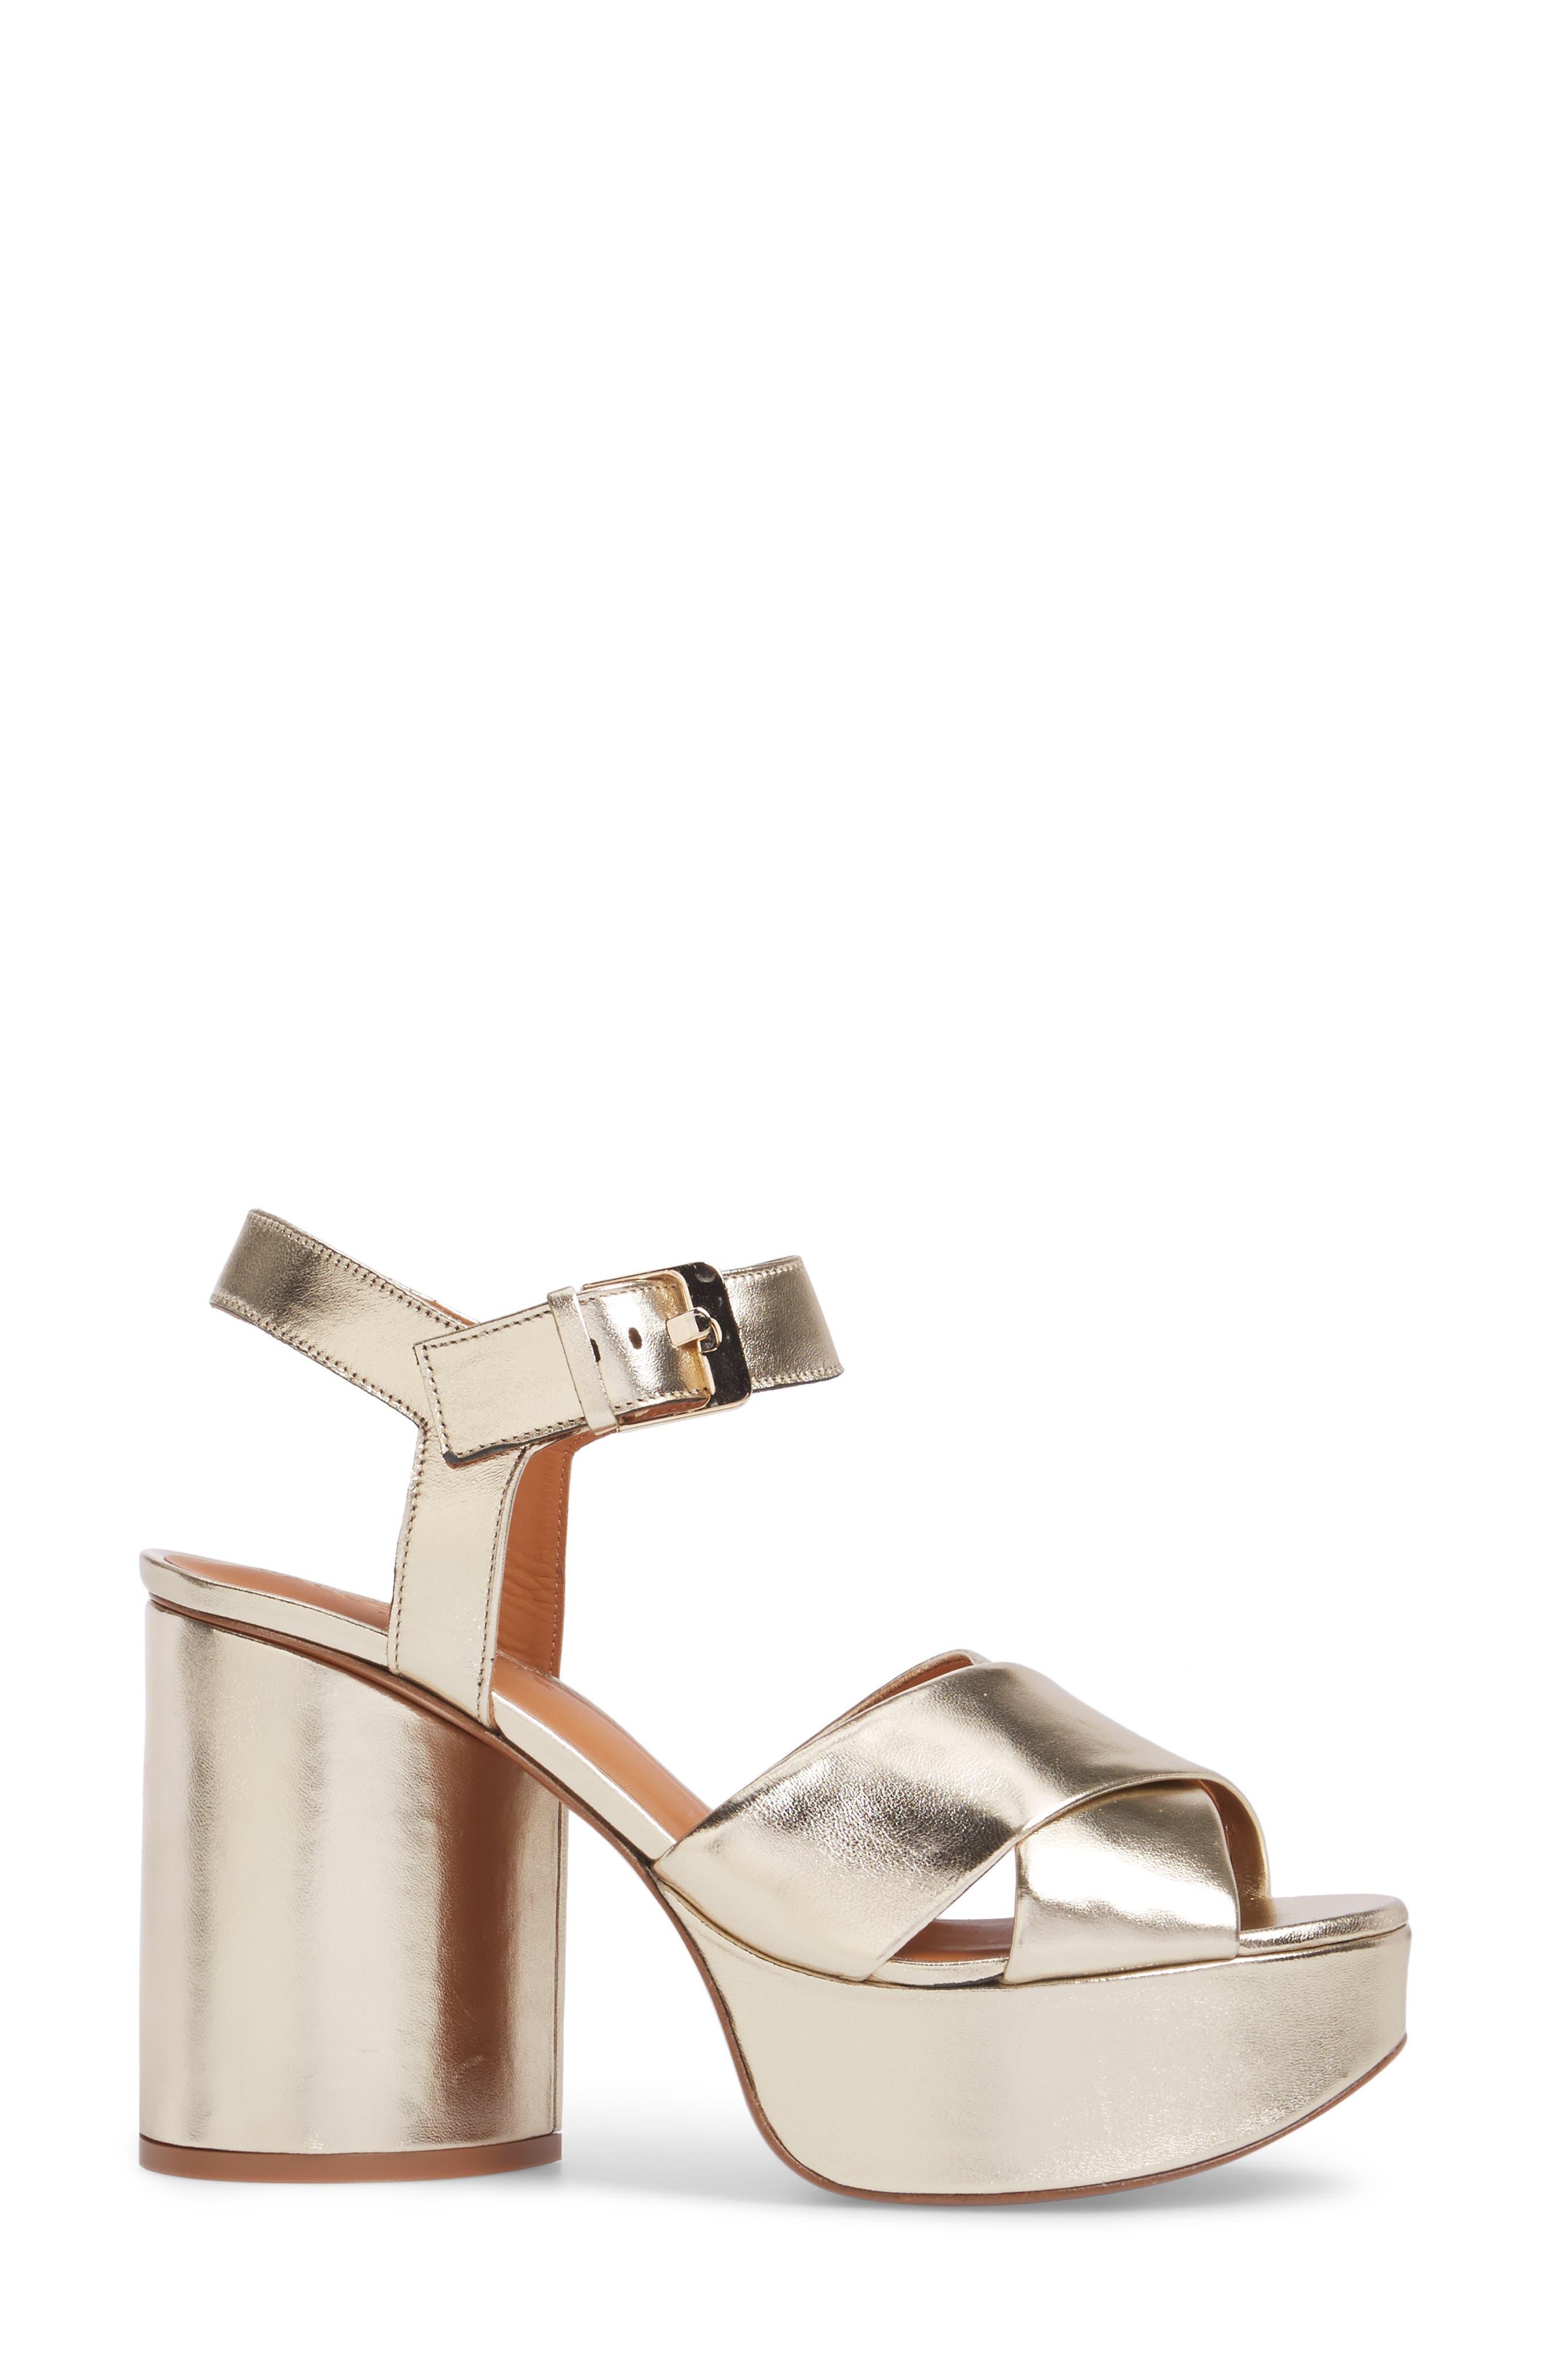 Vianne Ankle Strap Platform Sandal,                             Alternate thumbnail 3, color,                             Metallic Gold